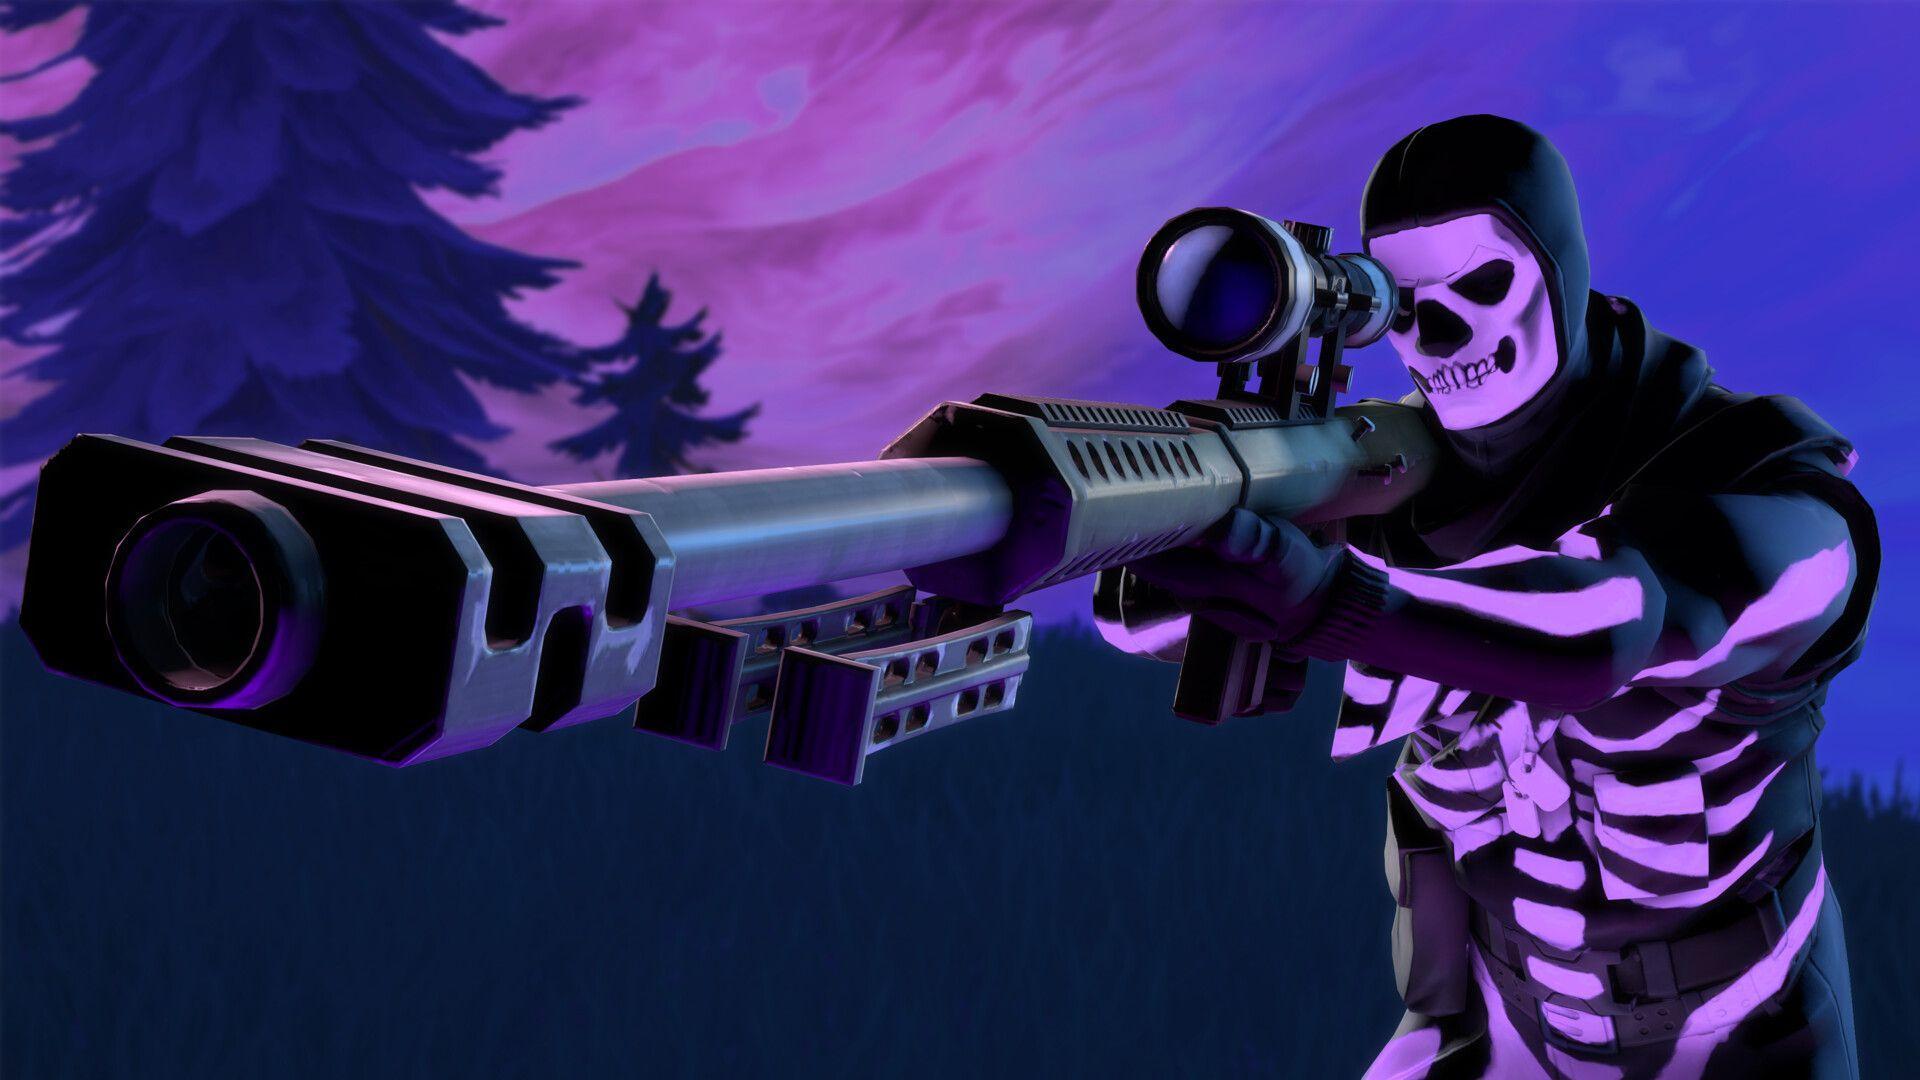 Purple Skull Trooper Wallpapers - Top Free Purple Skull ...